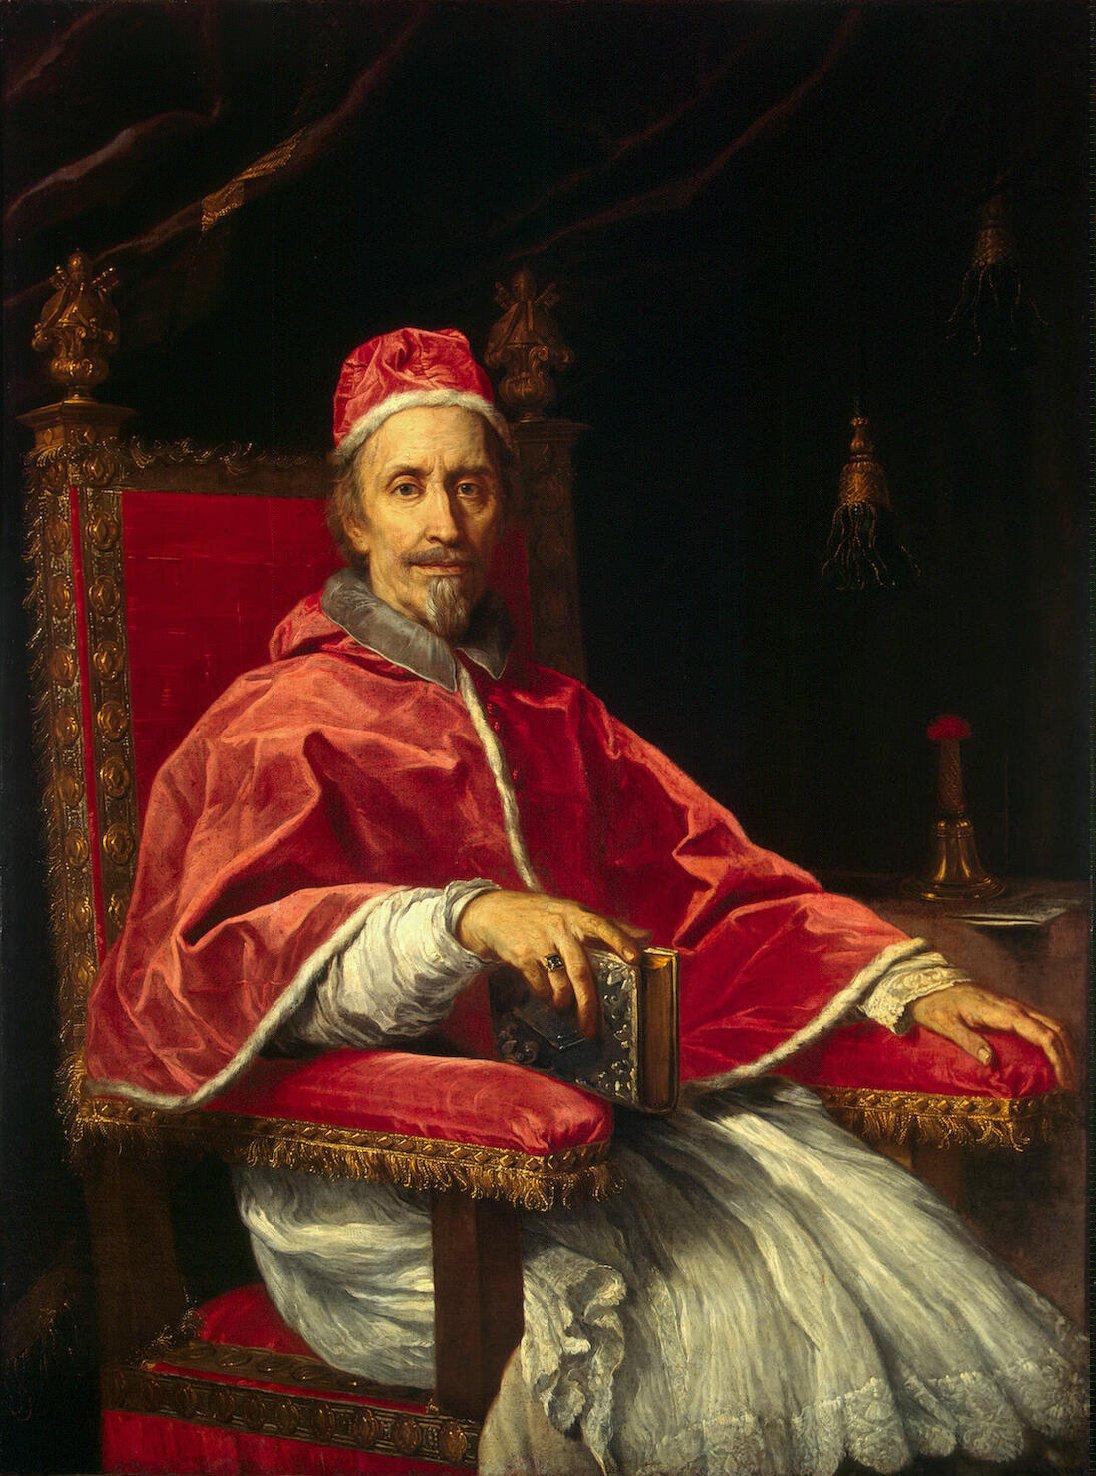 https://i2.wp.com/upload.wikimedia.org/wikipedia/commons/4/40/Pope_Clement_IX.jpg